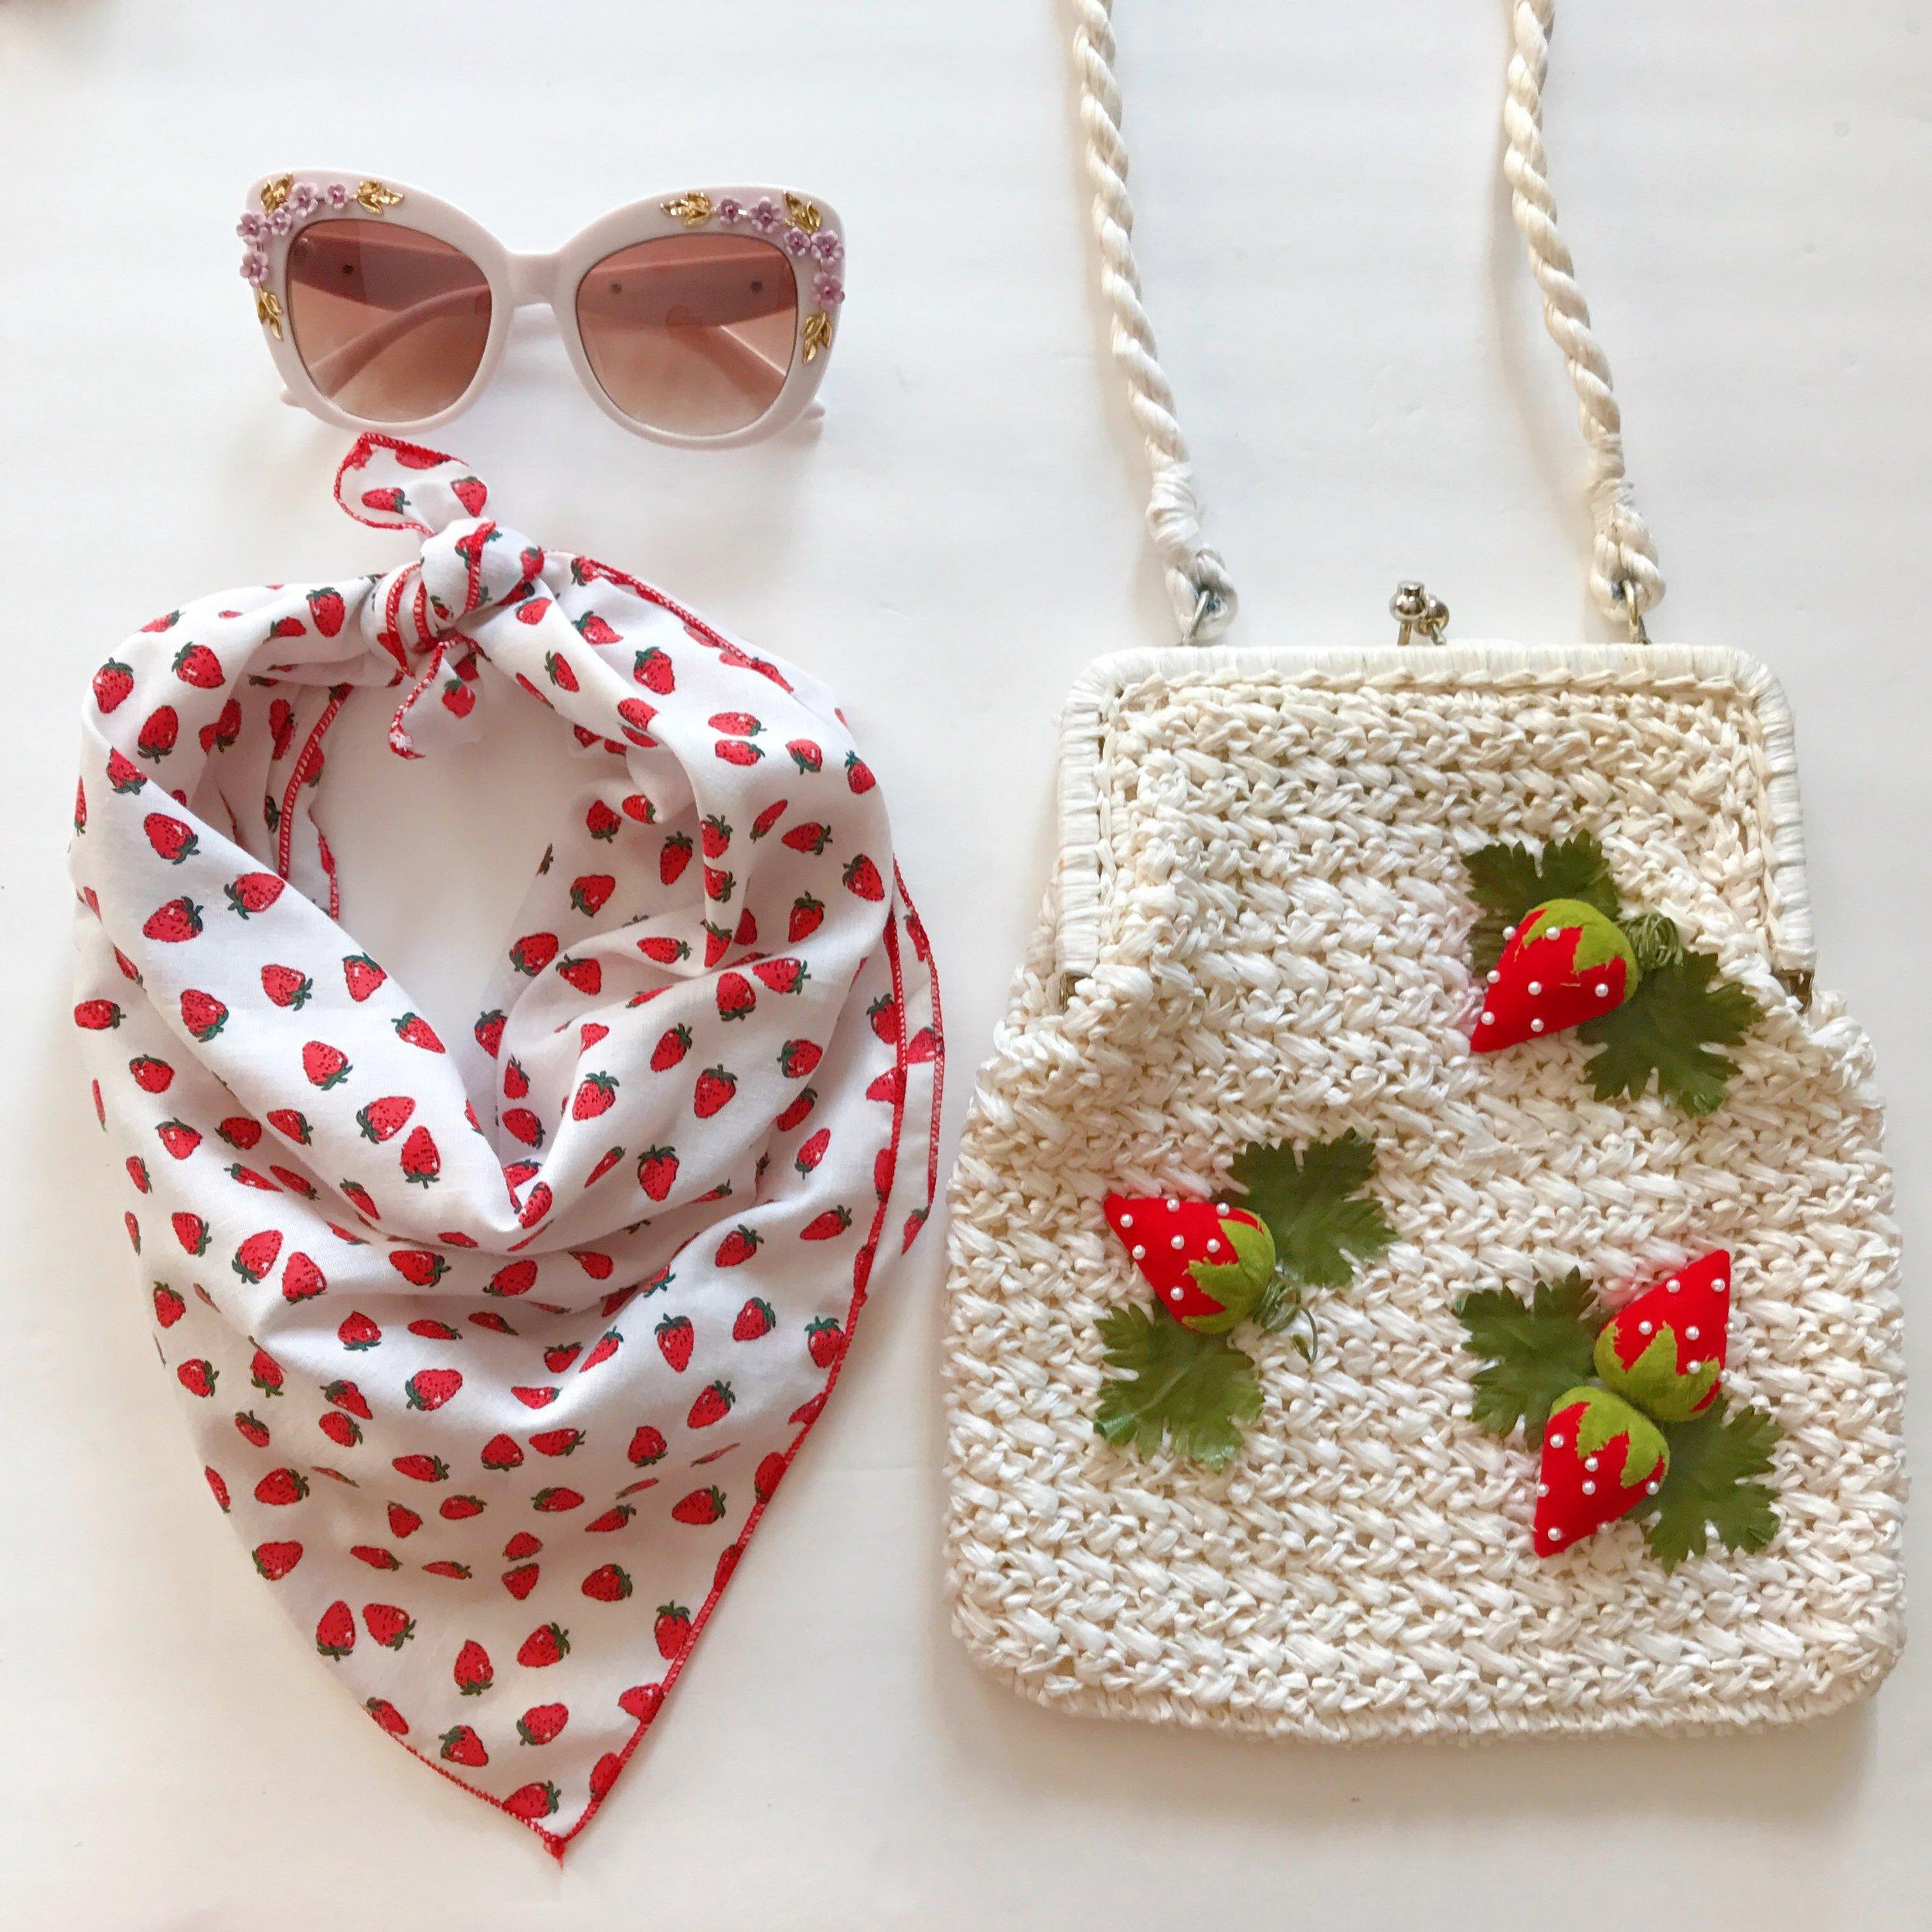 Floral embellished sunglasses, vintage strawberry print scarf & vintage 60's raffia purse with 3D strawberries